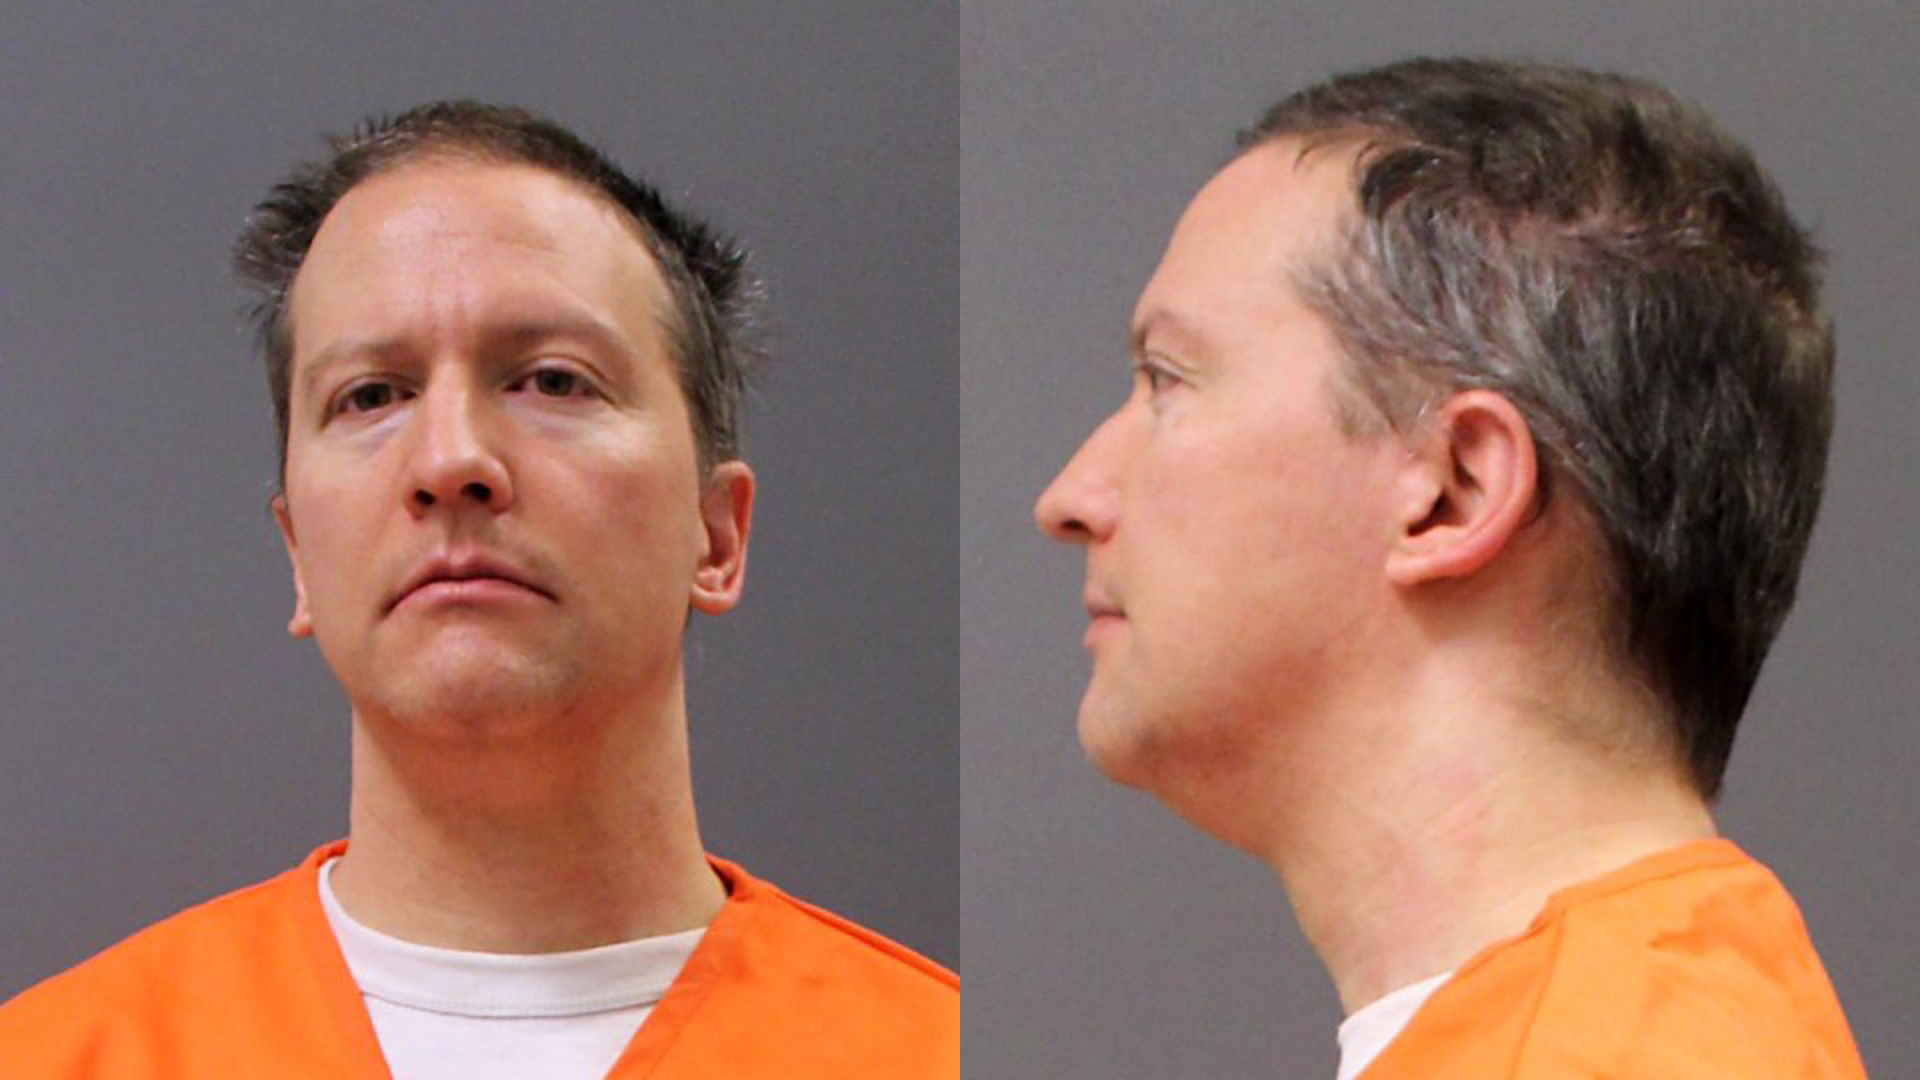 Derek Chauvin Was Just Sentenced to 22.5 Years for Murdering George Floyd